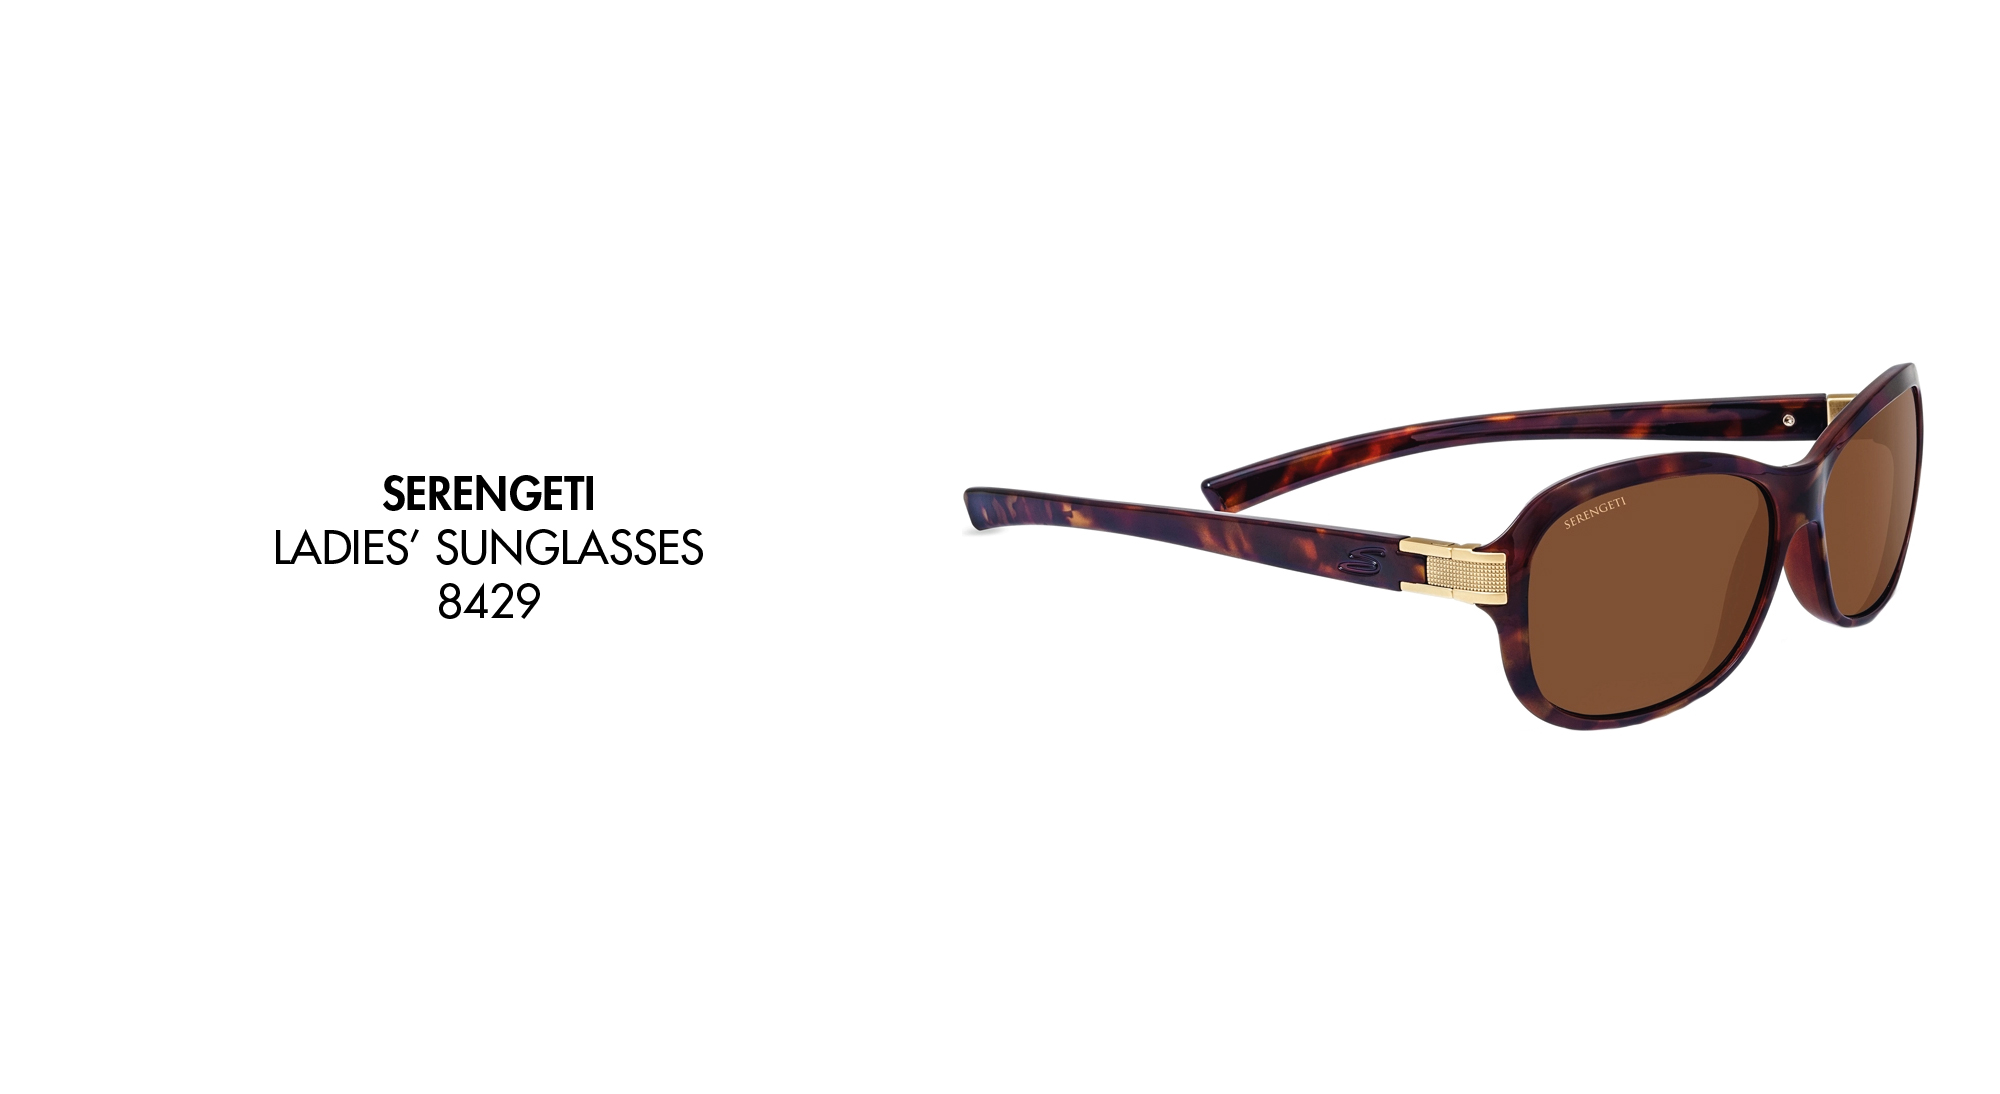 9dfe1f7553ac Serengeti 8270 Nuvino Shiny Black Polarized PhD 555nm Blue Mirror Sunglasses-  £112